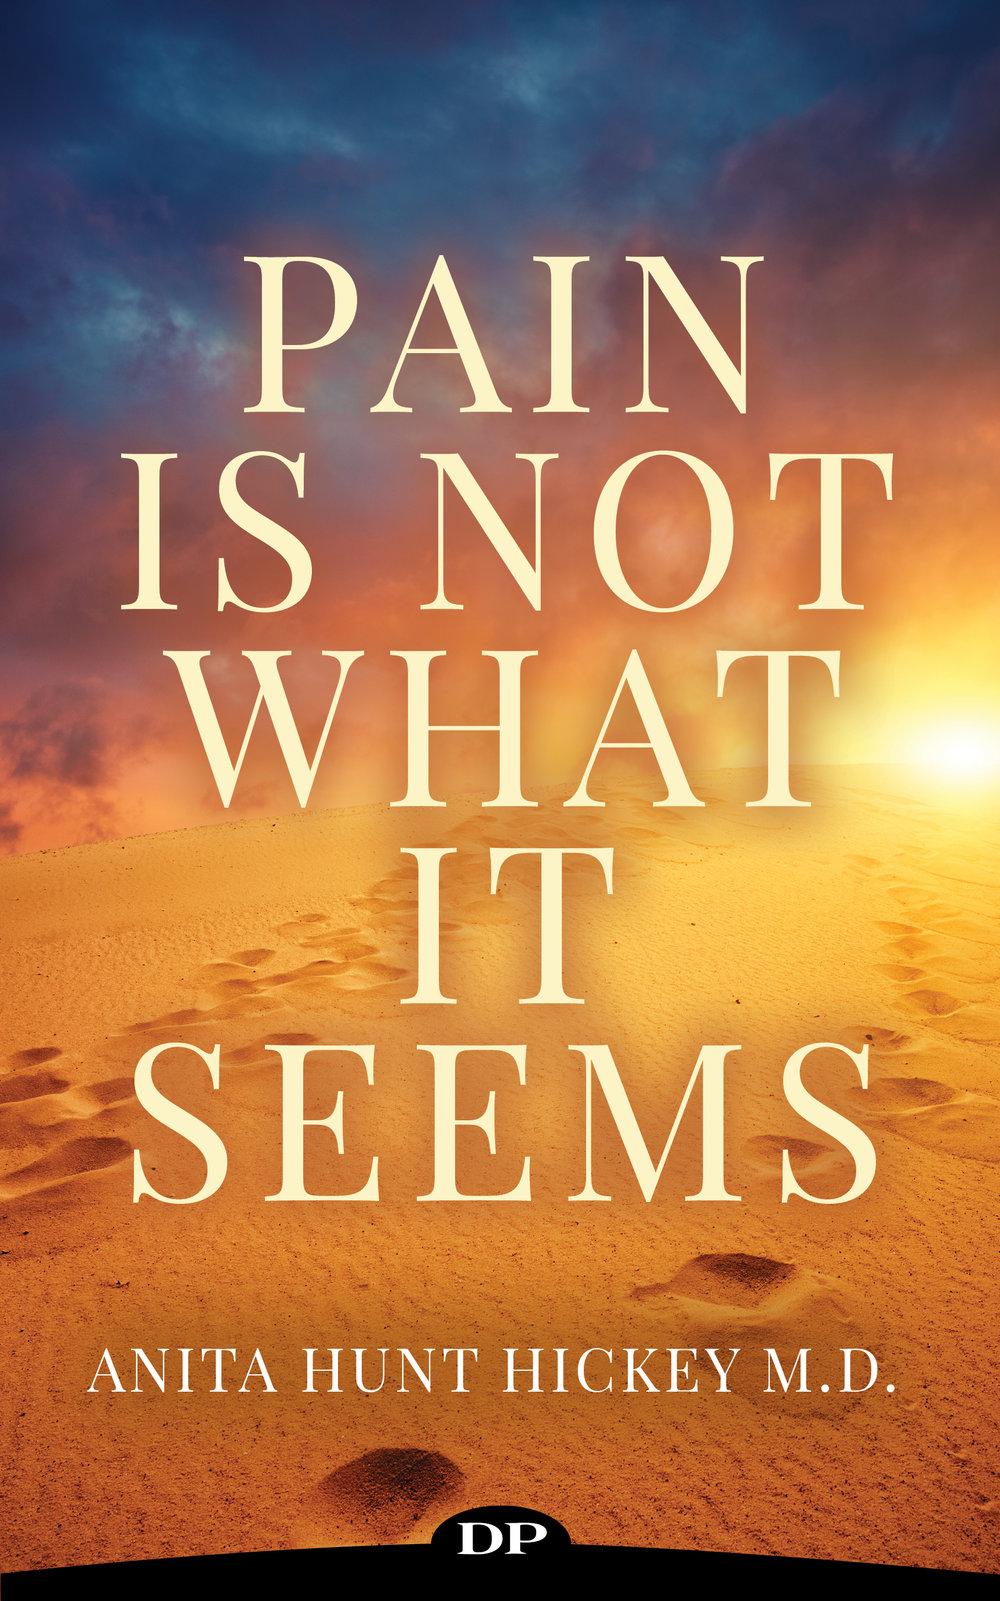 Hickey_Pain Is Not What It Seems_EBK_FINAL.jpg